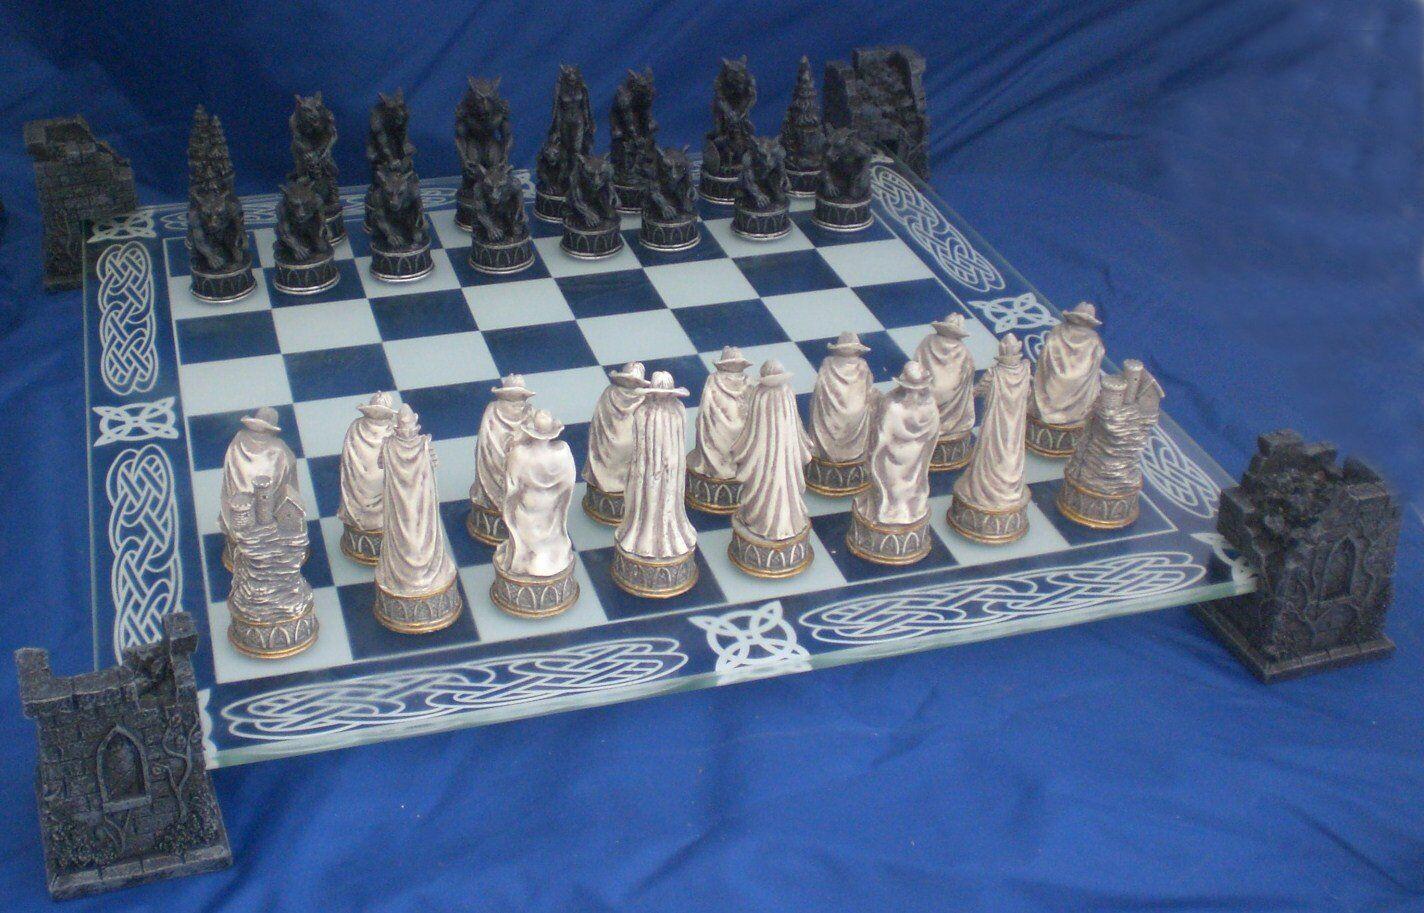 VAMPIRE & WEREWOLF CHESS SET Glass Board GOTHIC PAGAN CELTIC Fantasy TWILIGHT